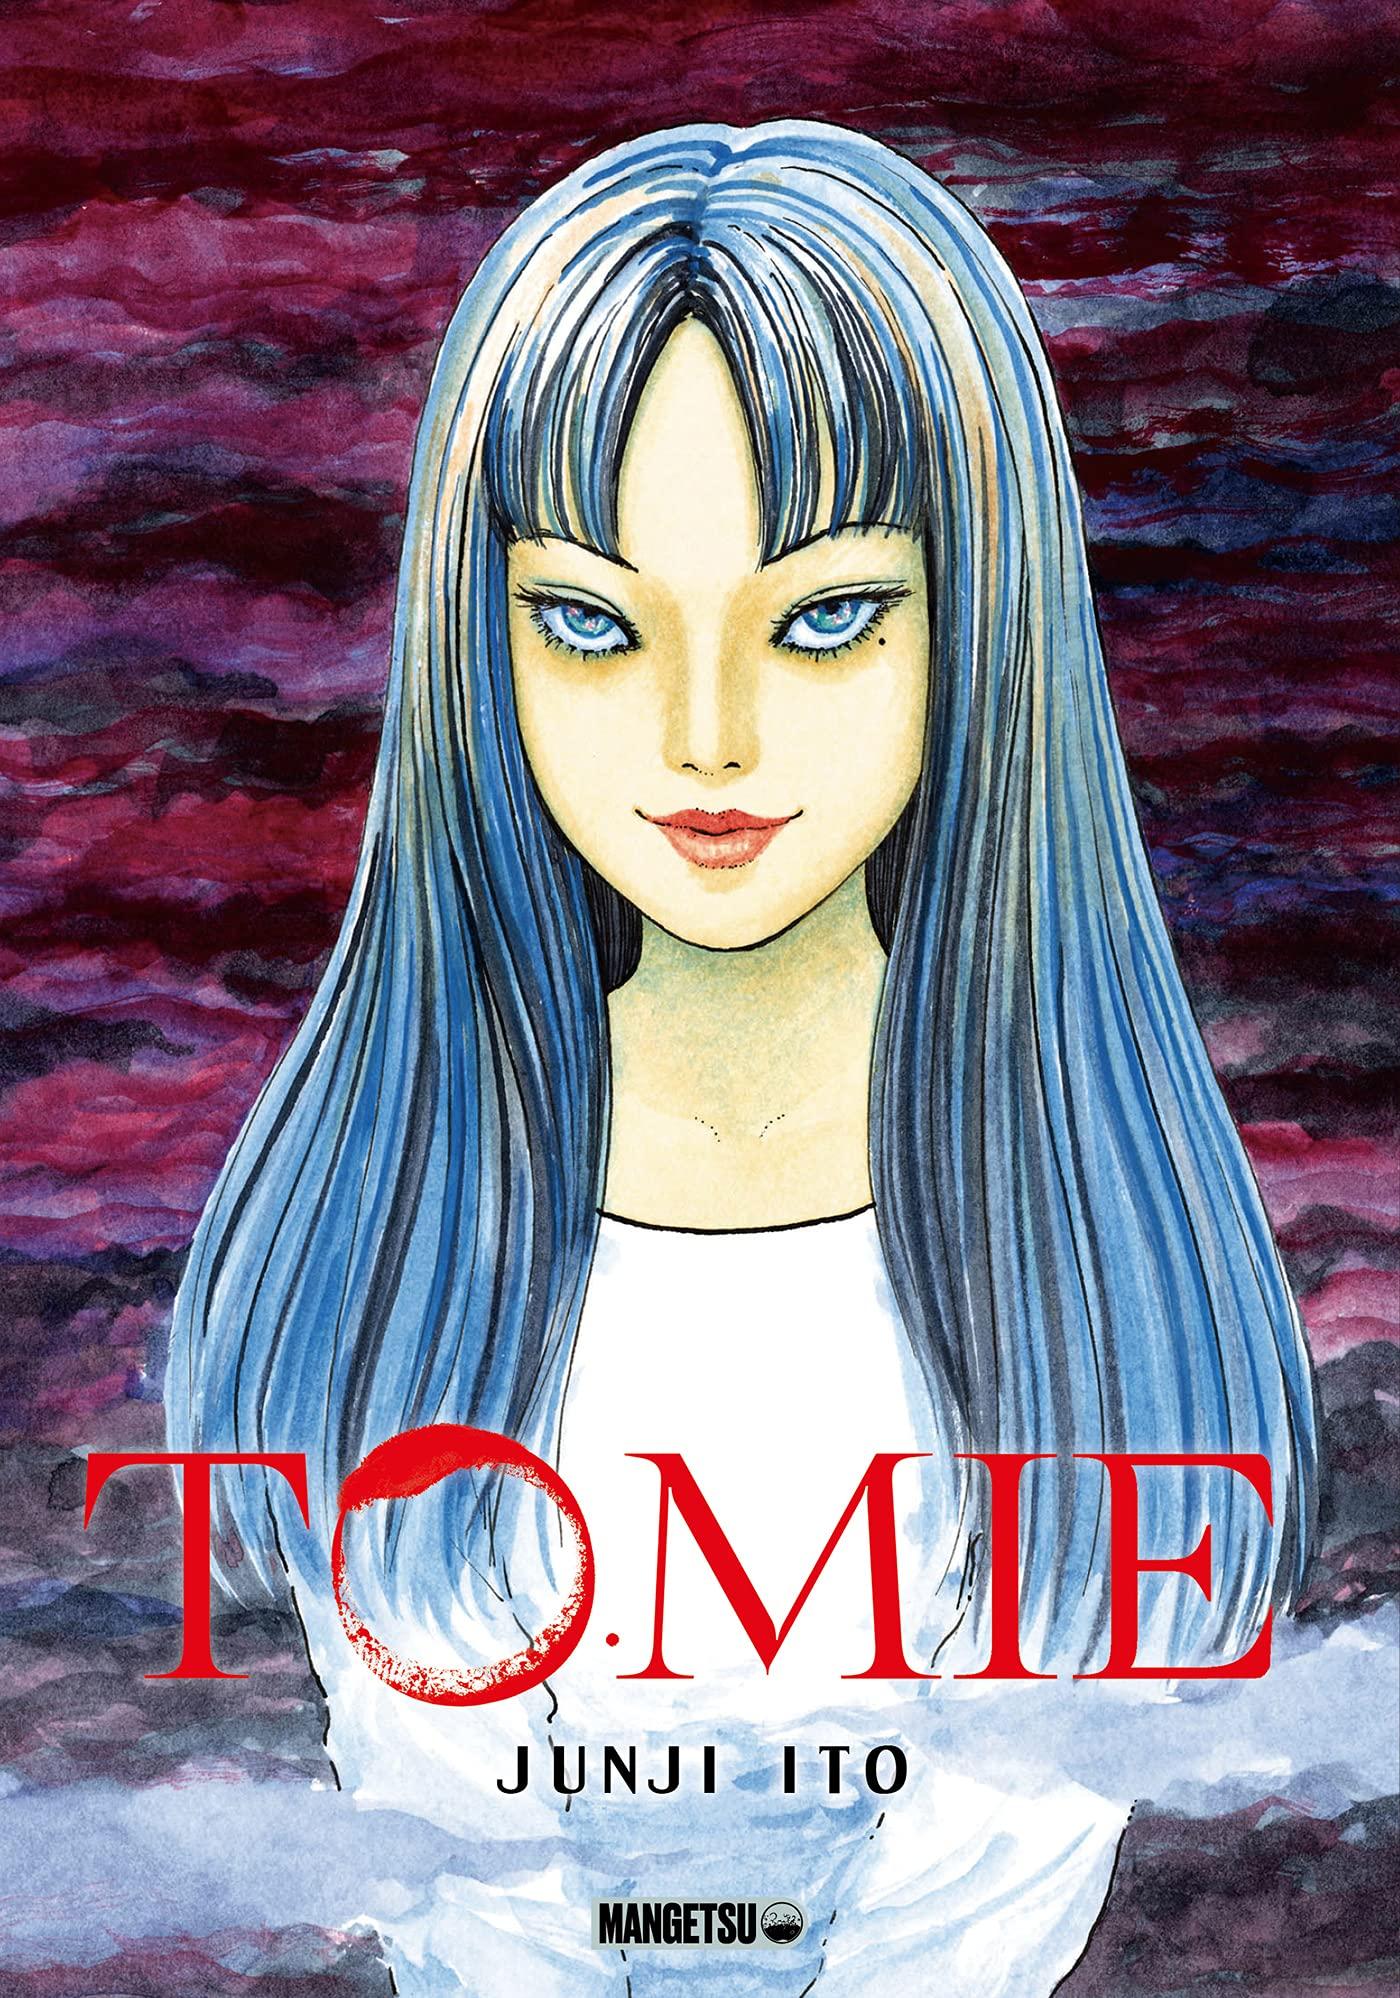 Tomie 1